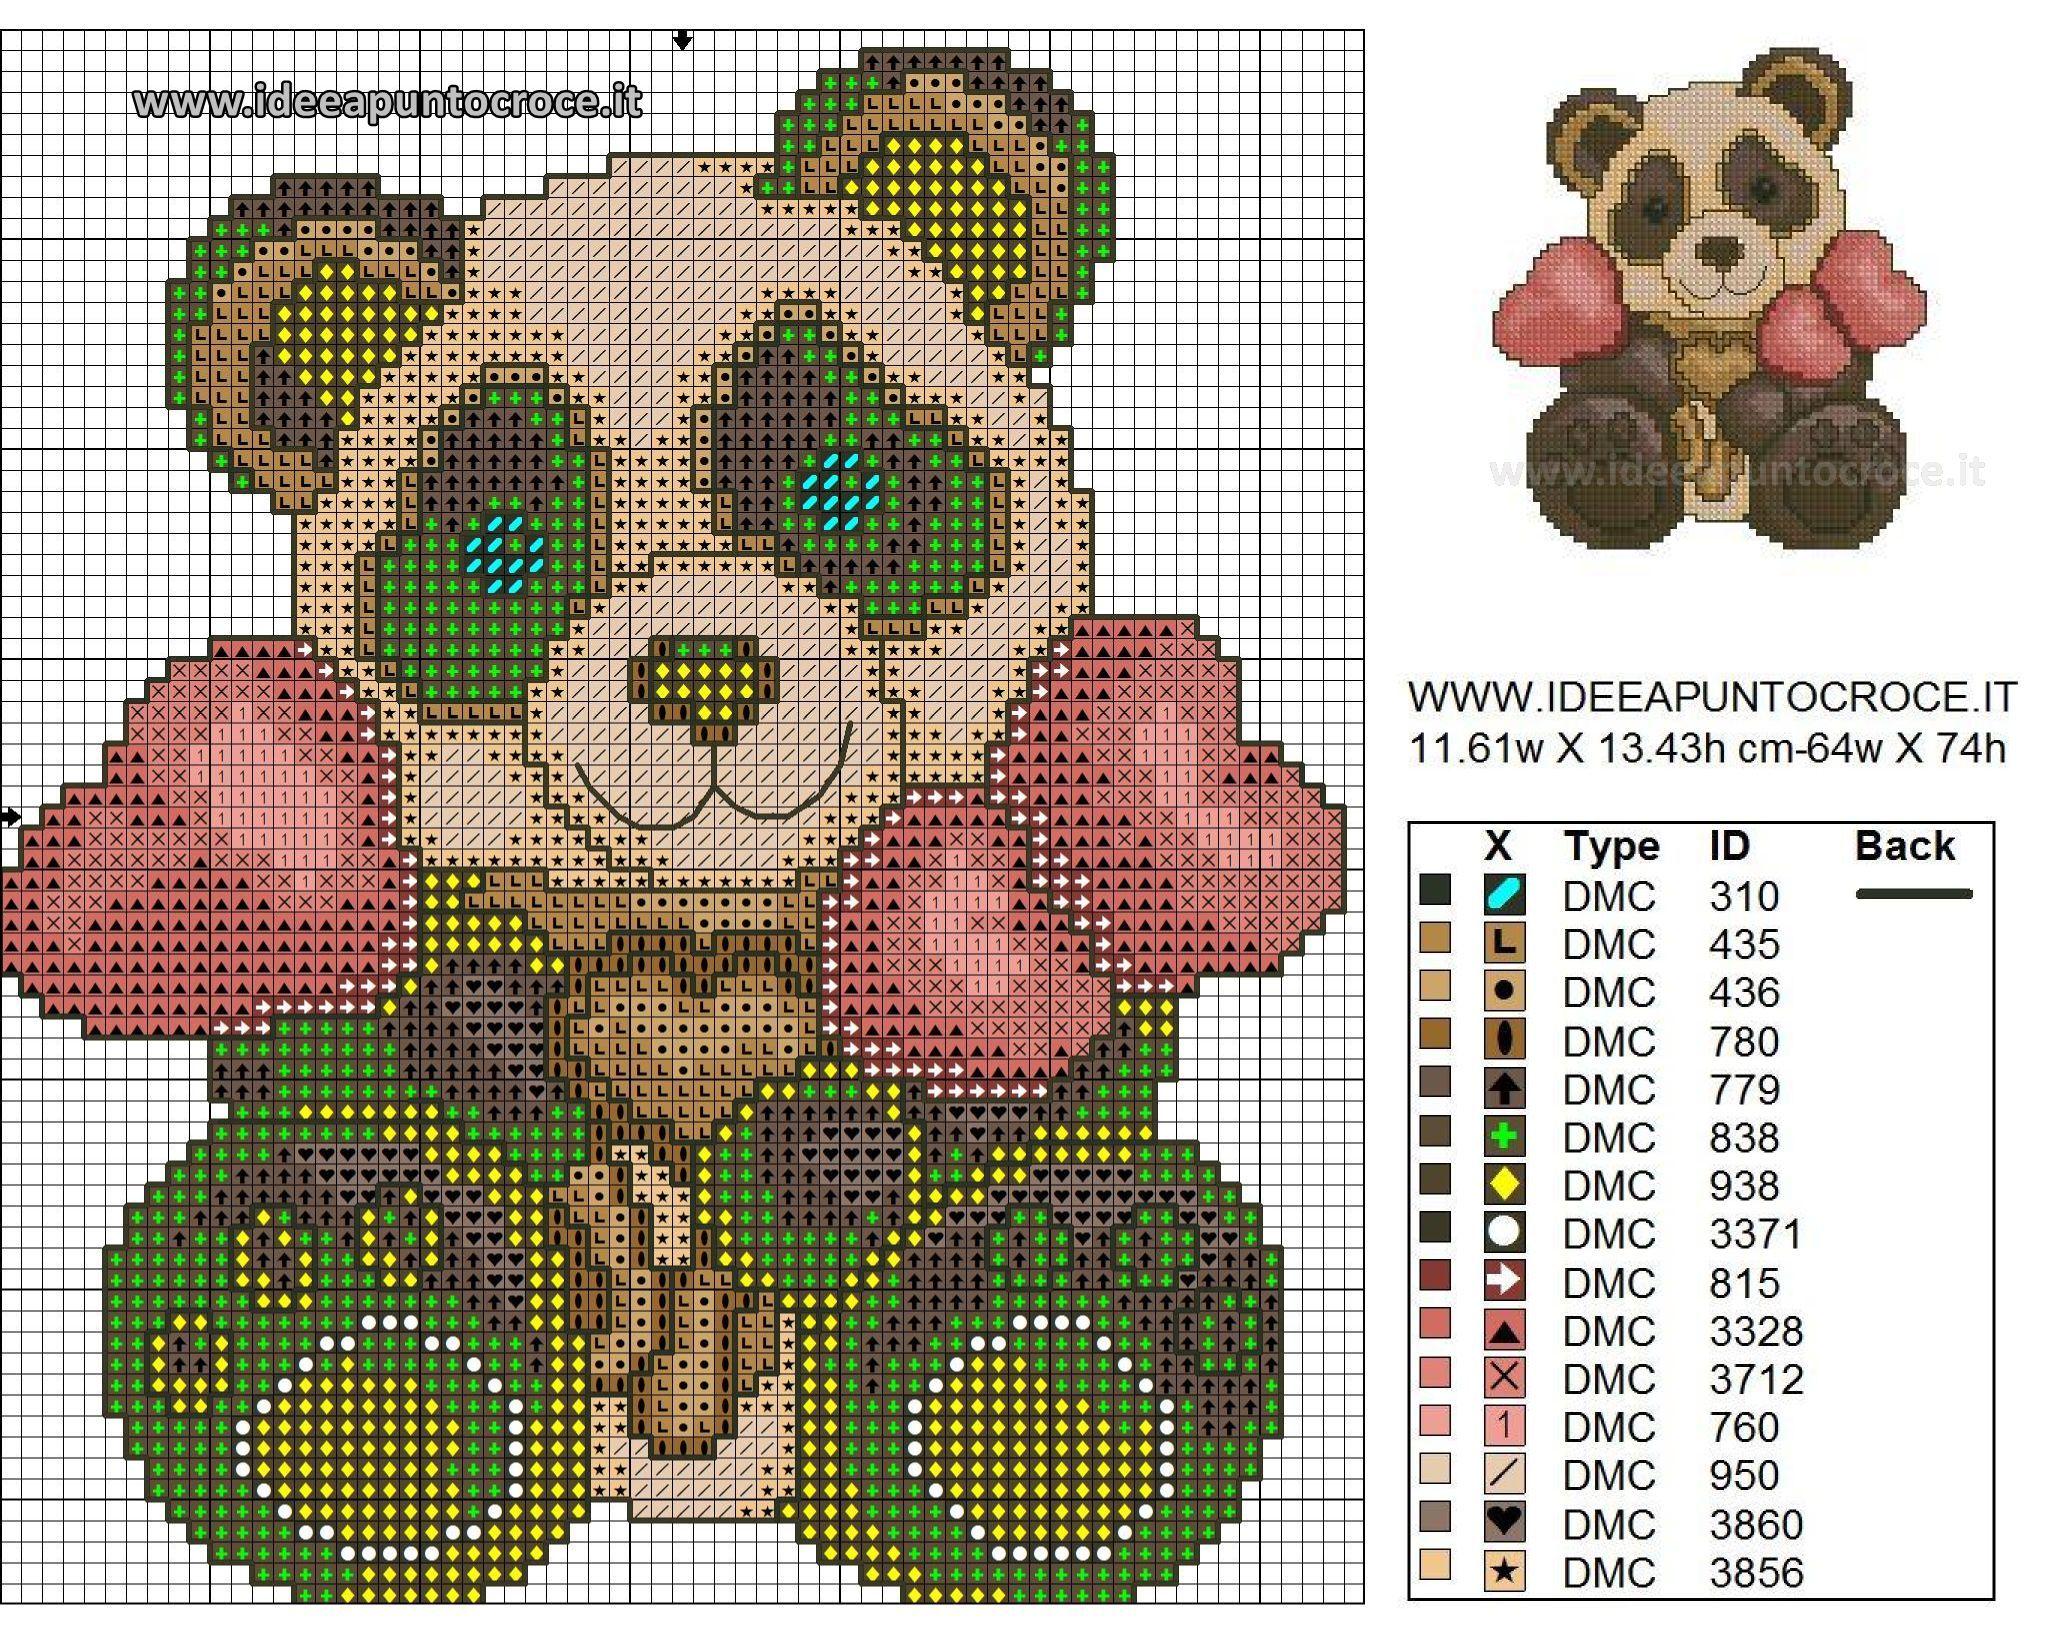 Panda thun 2017 schema punto croce animali baby 6 - Panda thun 2017 ...